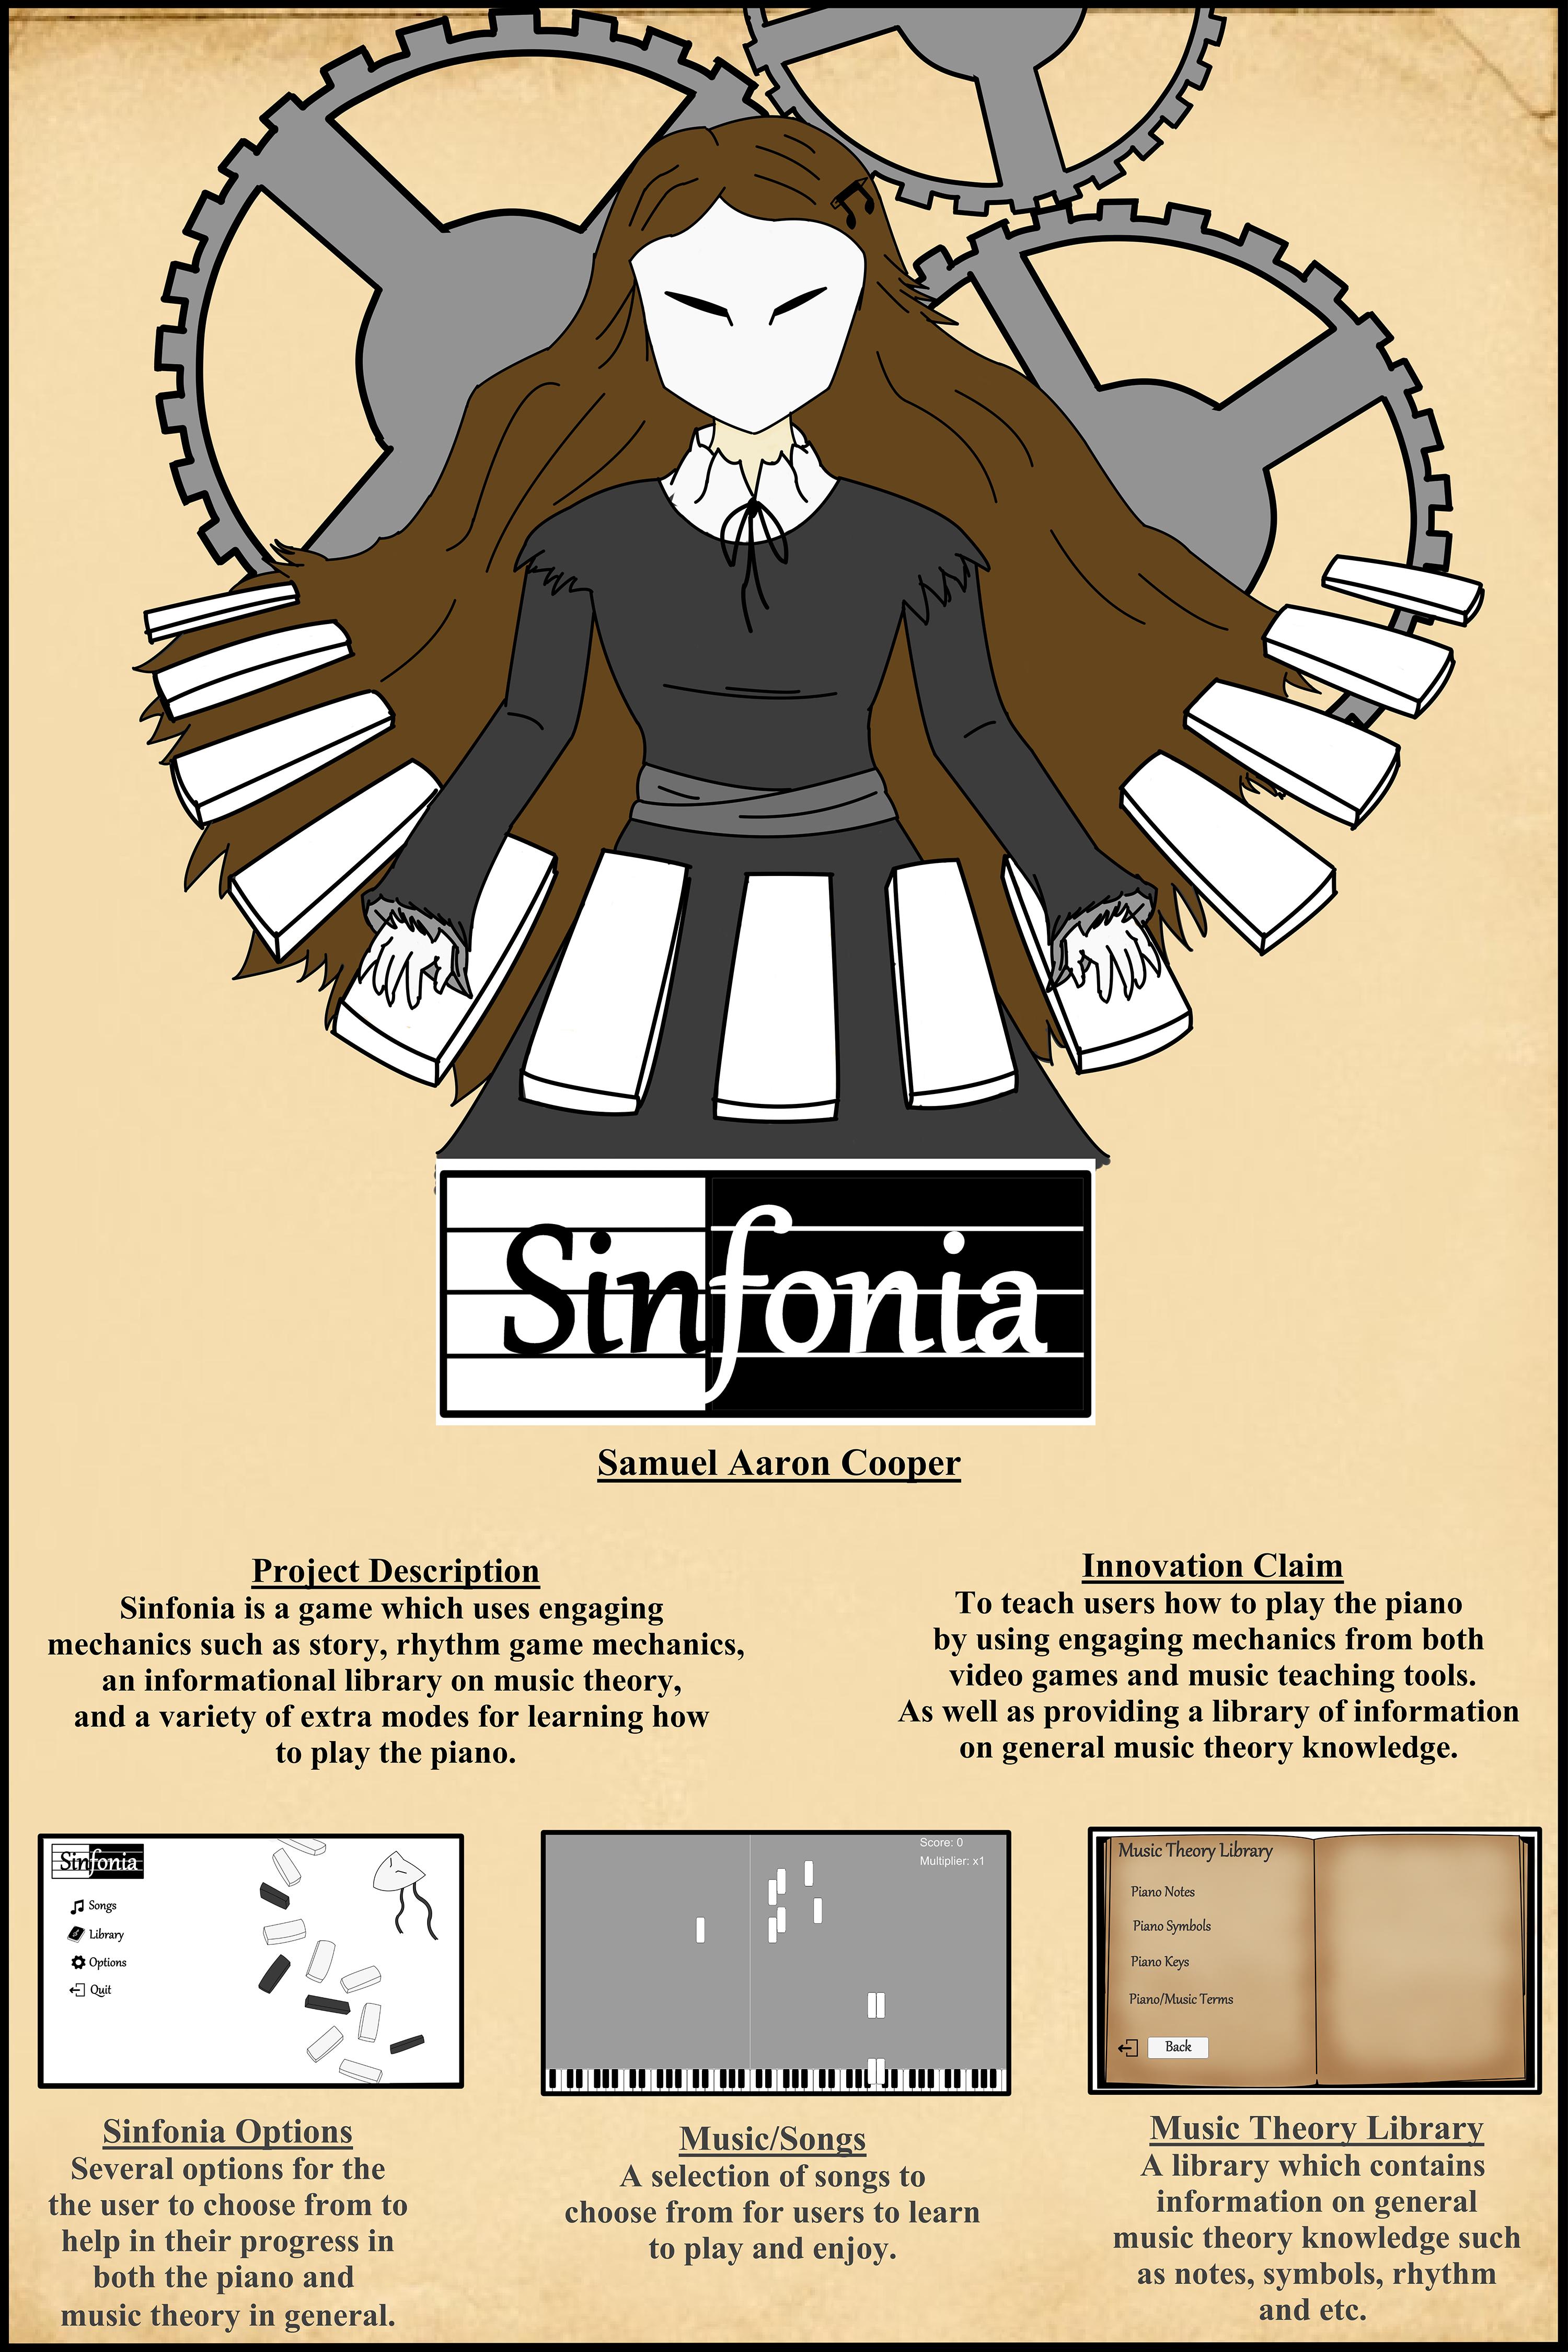 Sinfonia Poster (Update 5)